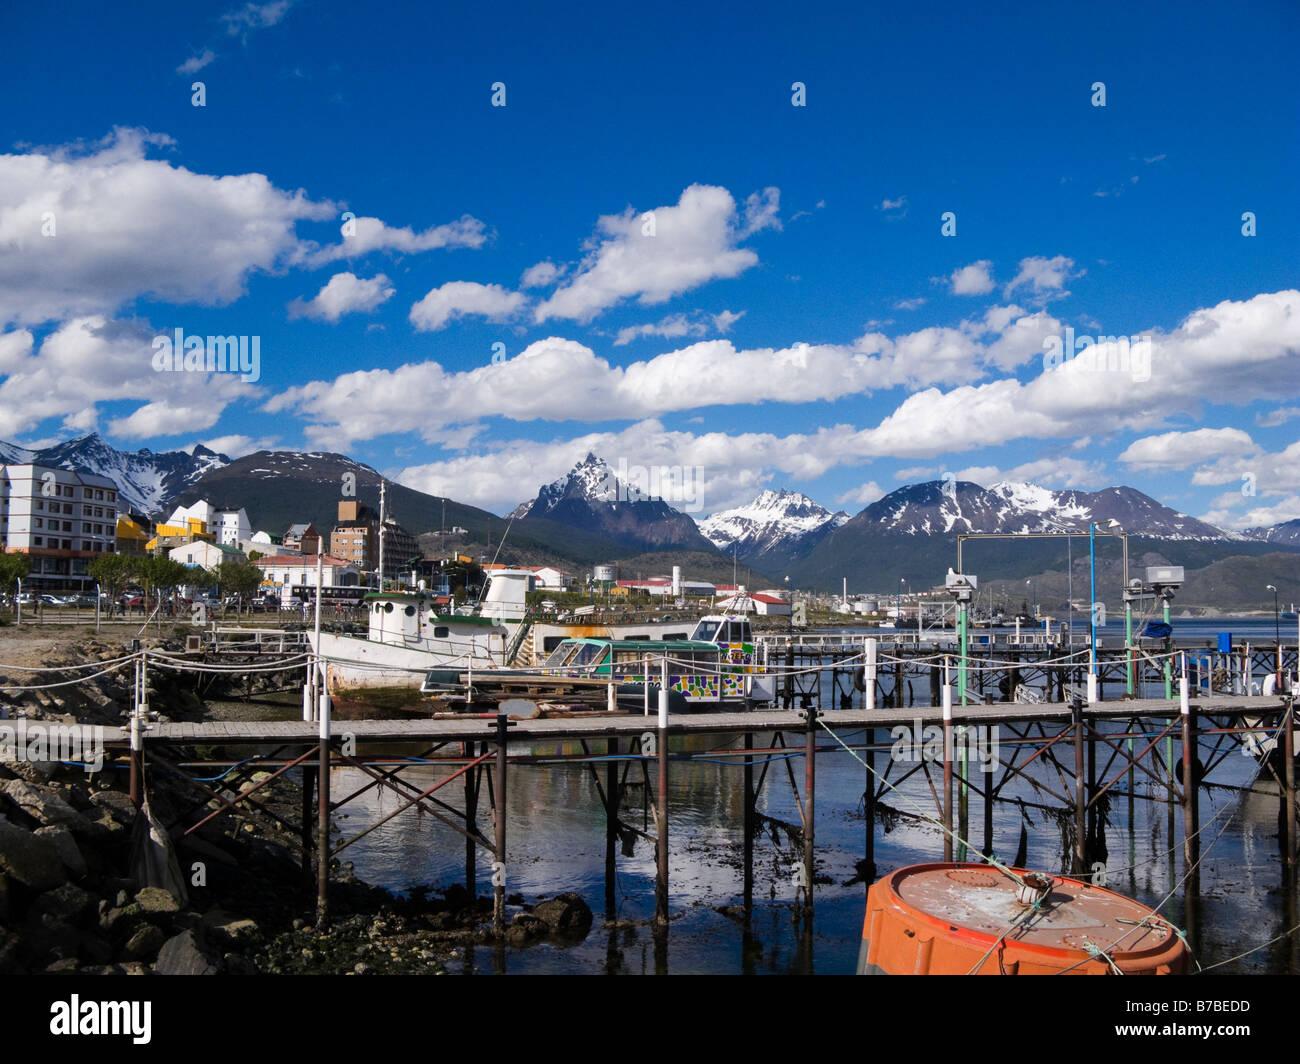 Pier Ushuaia Patagonia Tierra de Fuego Province Argentina South America - Stock Image